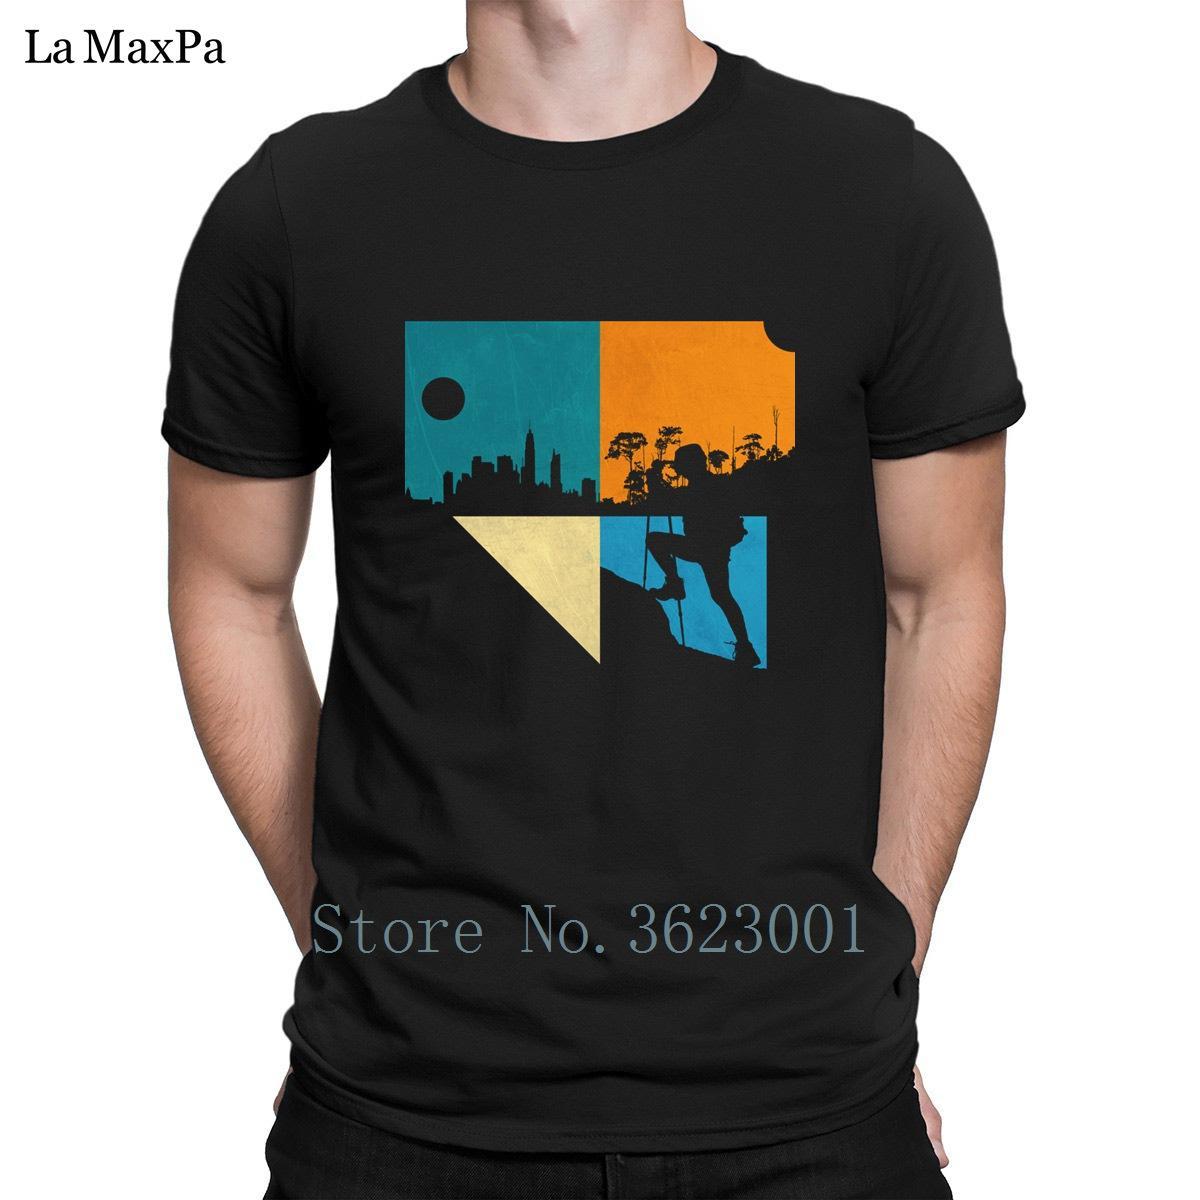 Funky T Shirt T-shirt Creatura Fun Tshirt Mens Questa è la mia avventura Tee Shirt Basic Solid Uomo In vendita Men S-3XL Cheap